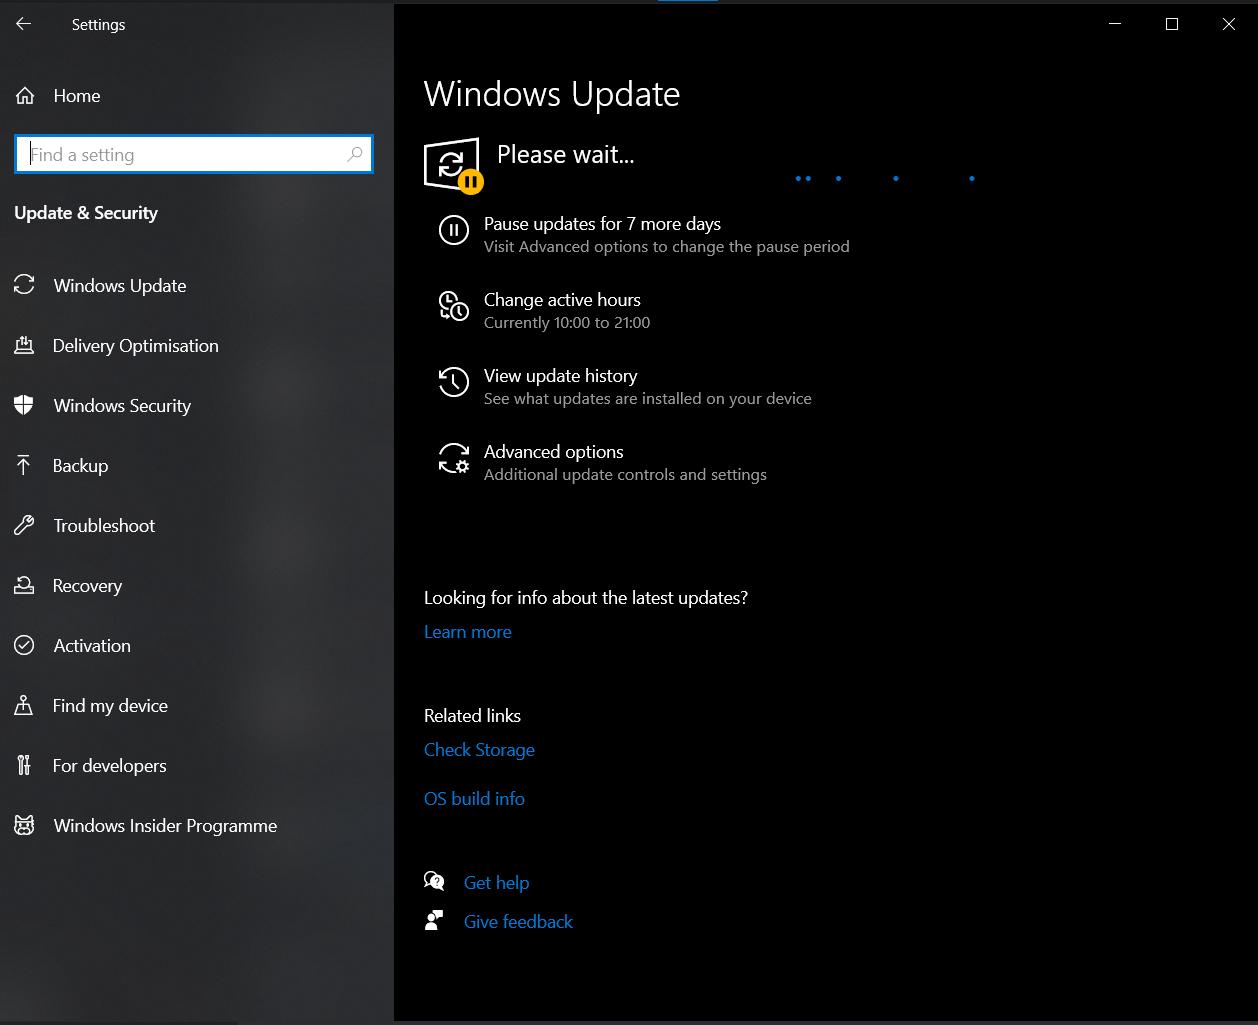 Windows Update stuck at please wait caaf5bde-a1e5-4c44-8e8b-0ee8048a7443?upload=true.png